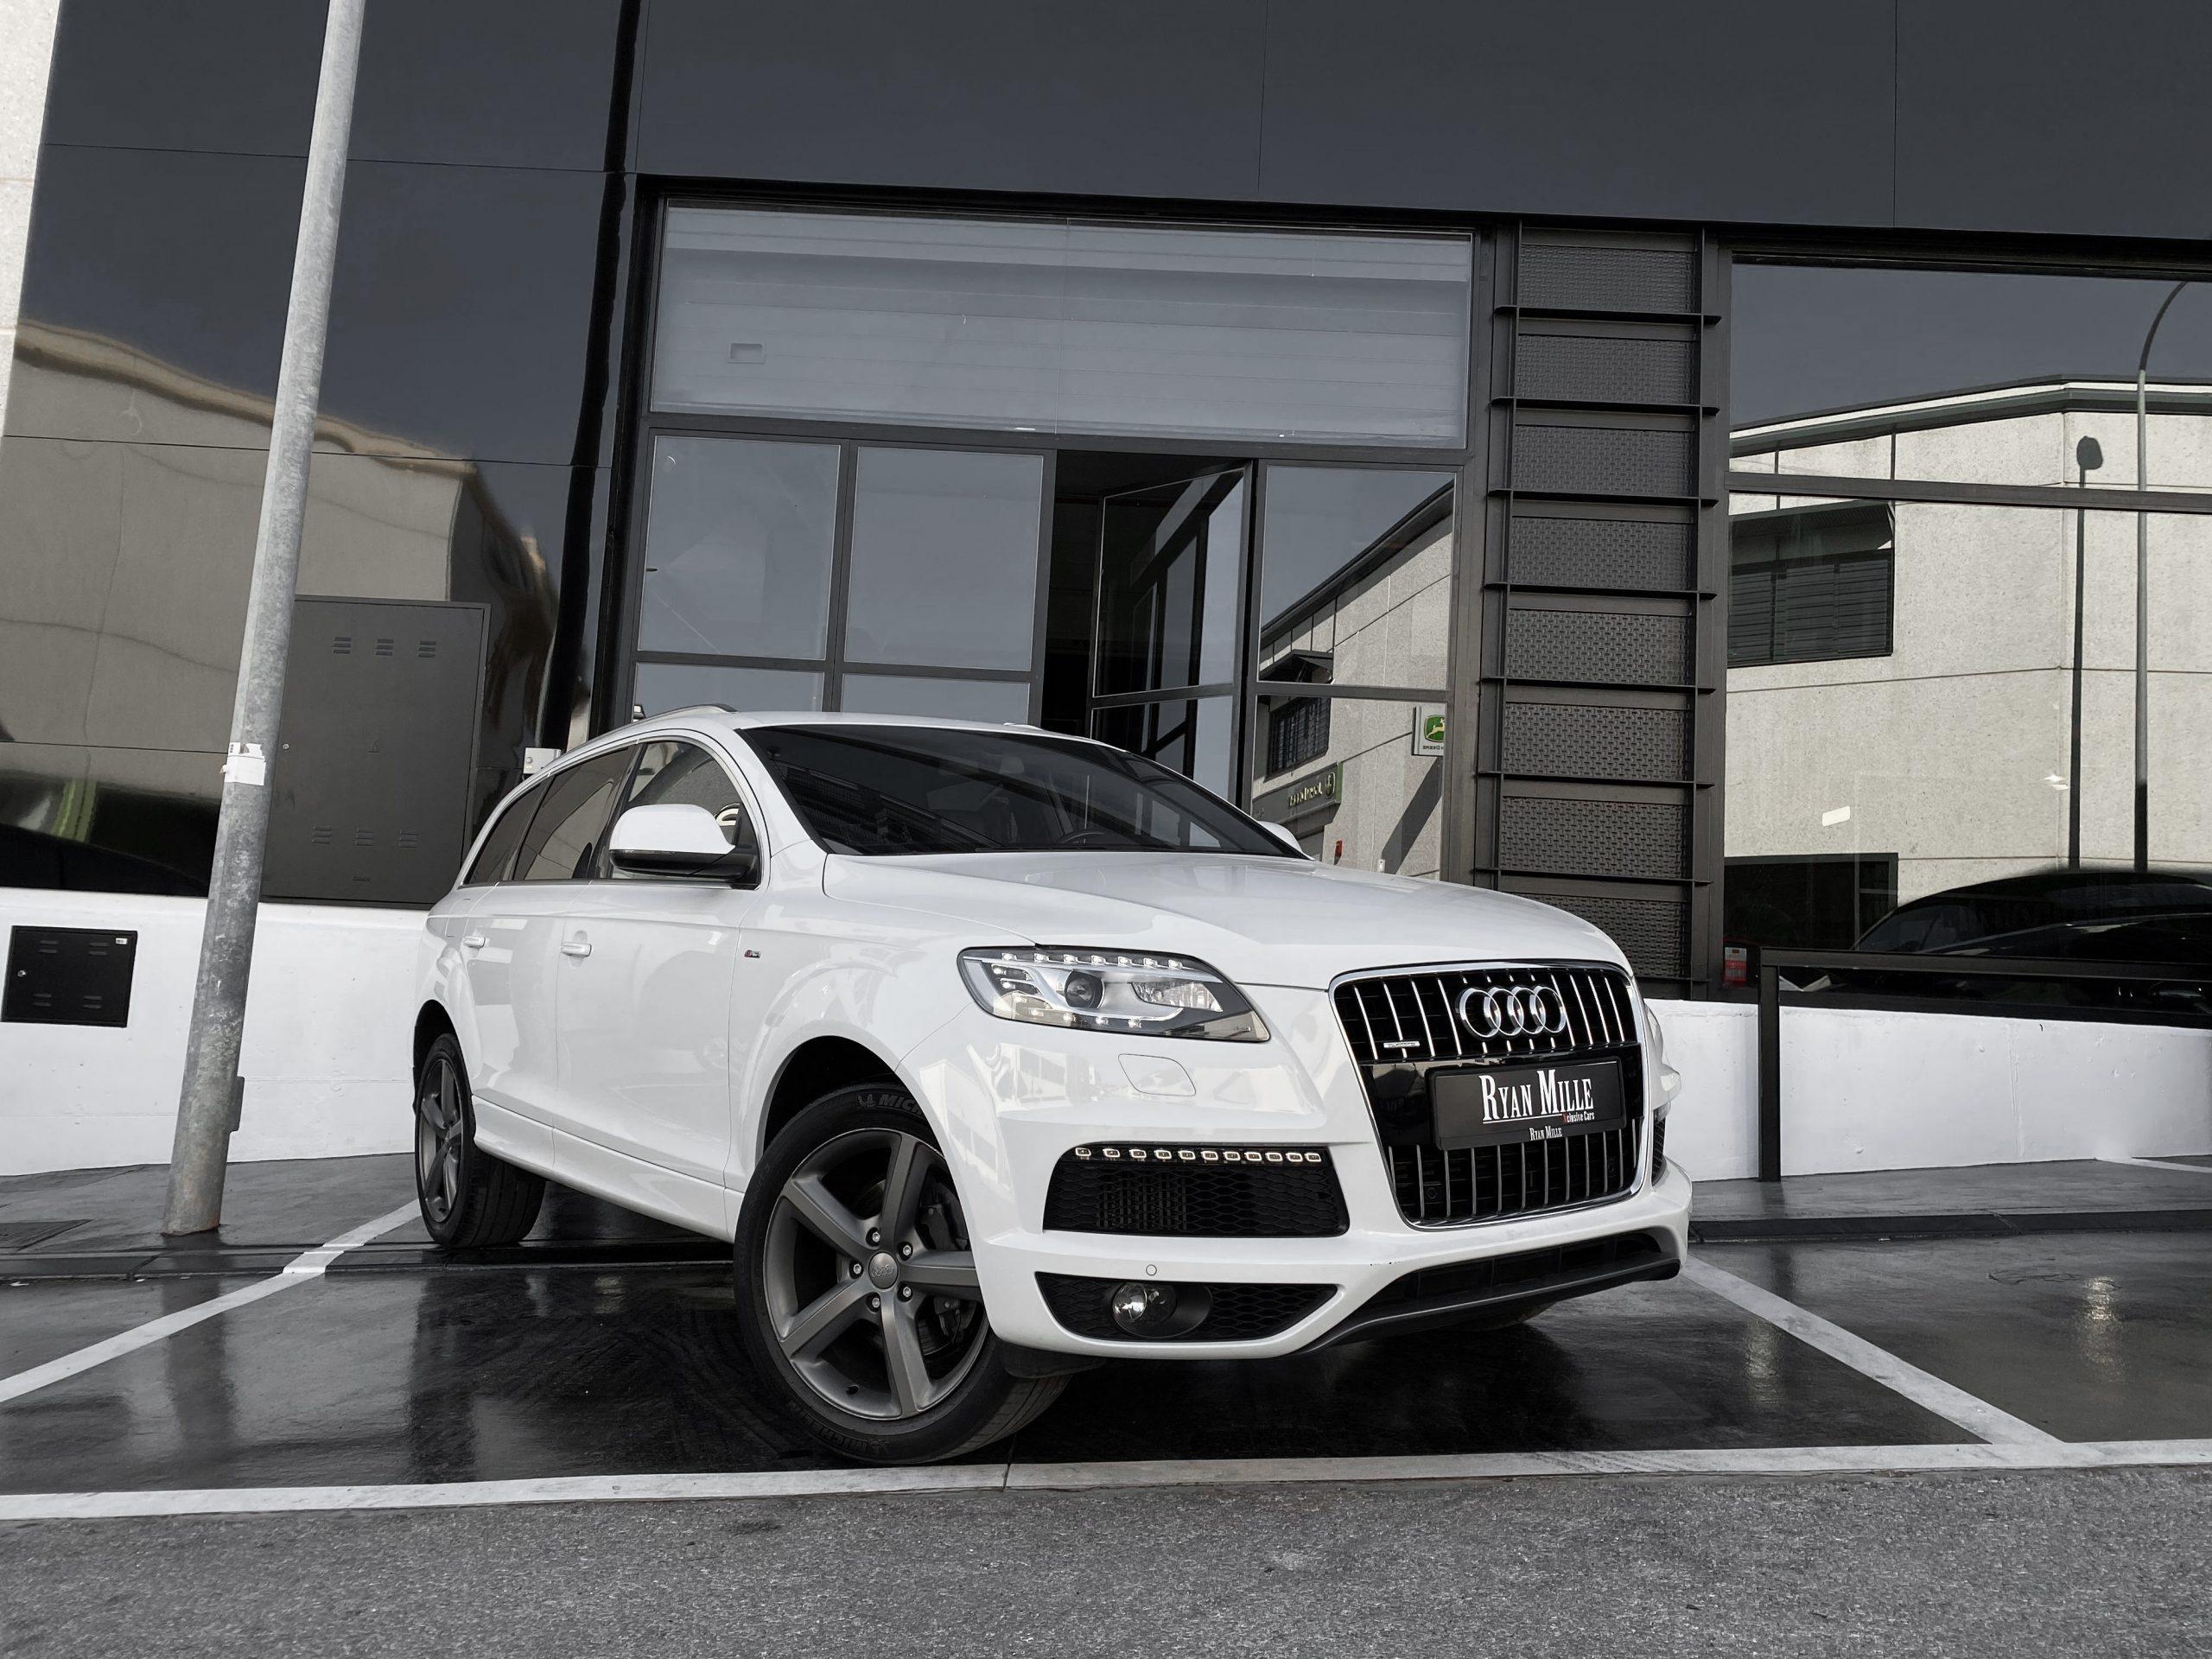 Kekurangan Audi Q7 3.0 Tdi Spesifikasi